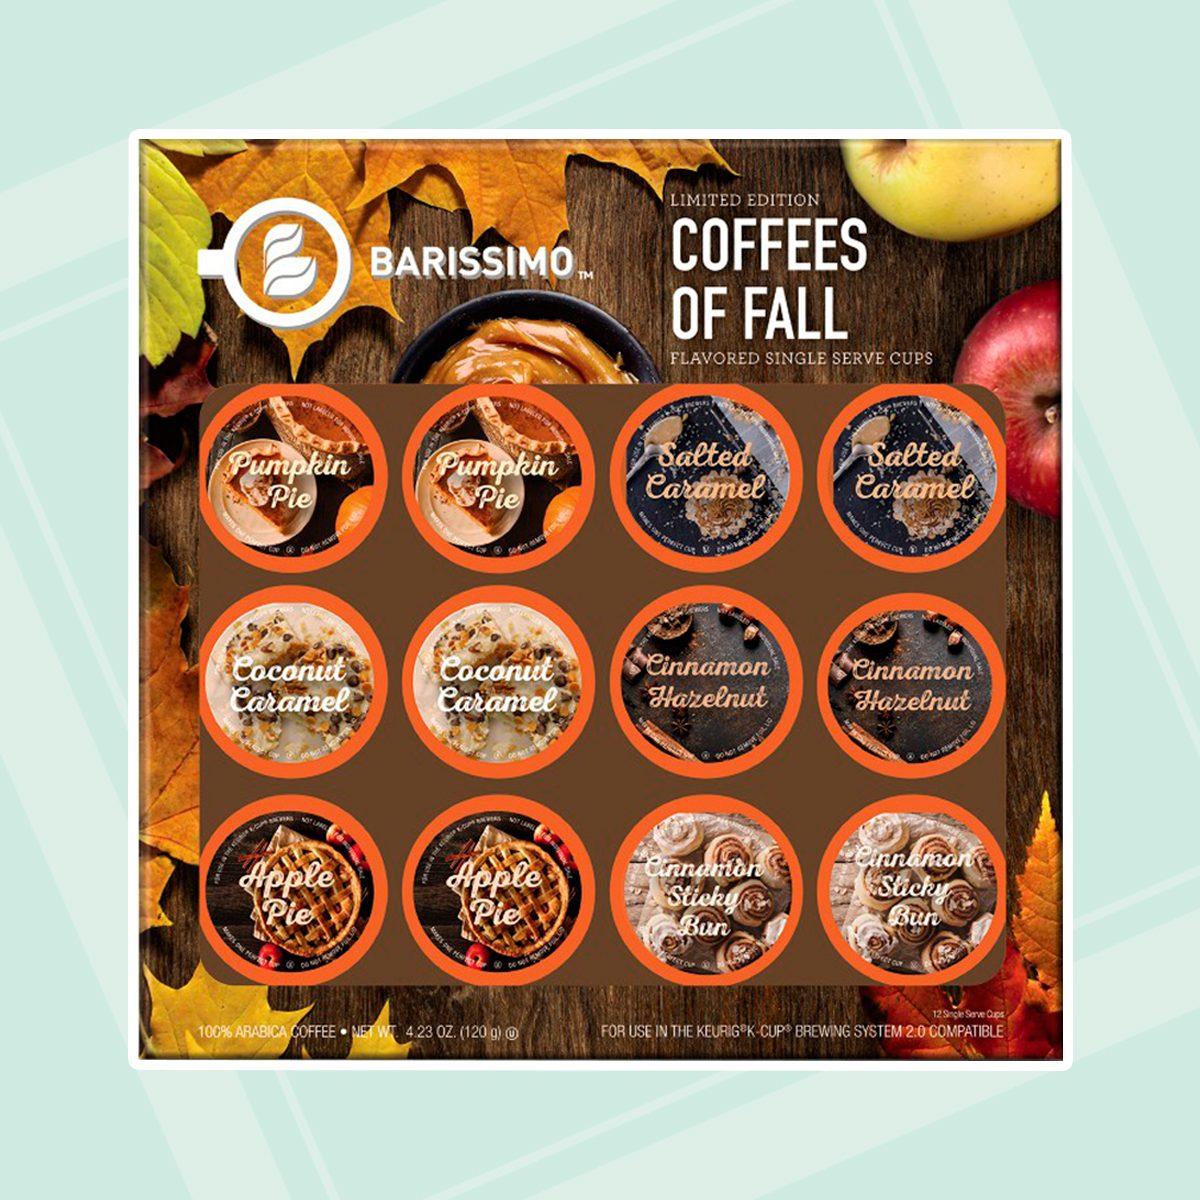 Aldi Barissimo Coffees of Fall